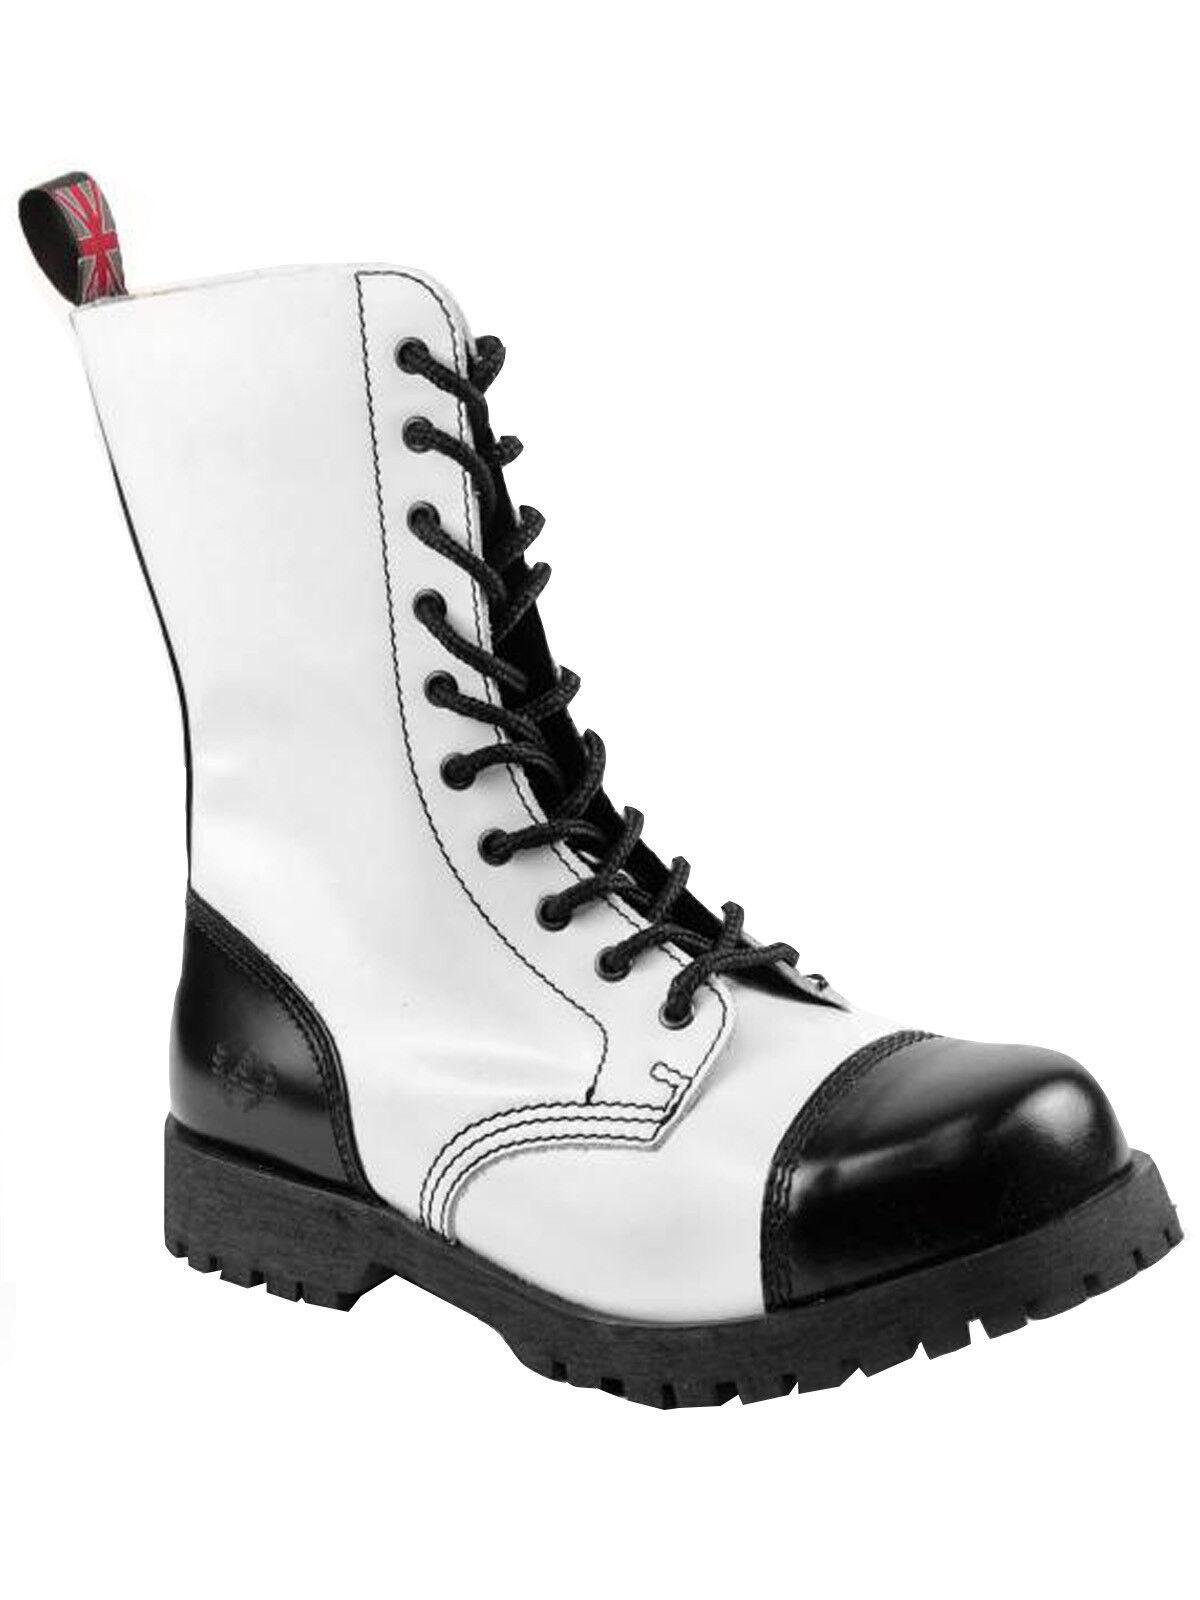 Alpha RANGER Springer Stivali Stivali 10 fori Boot/Rangers Stivali Springer Nero/Bianco #5013 b361d9